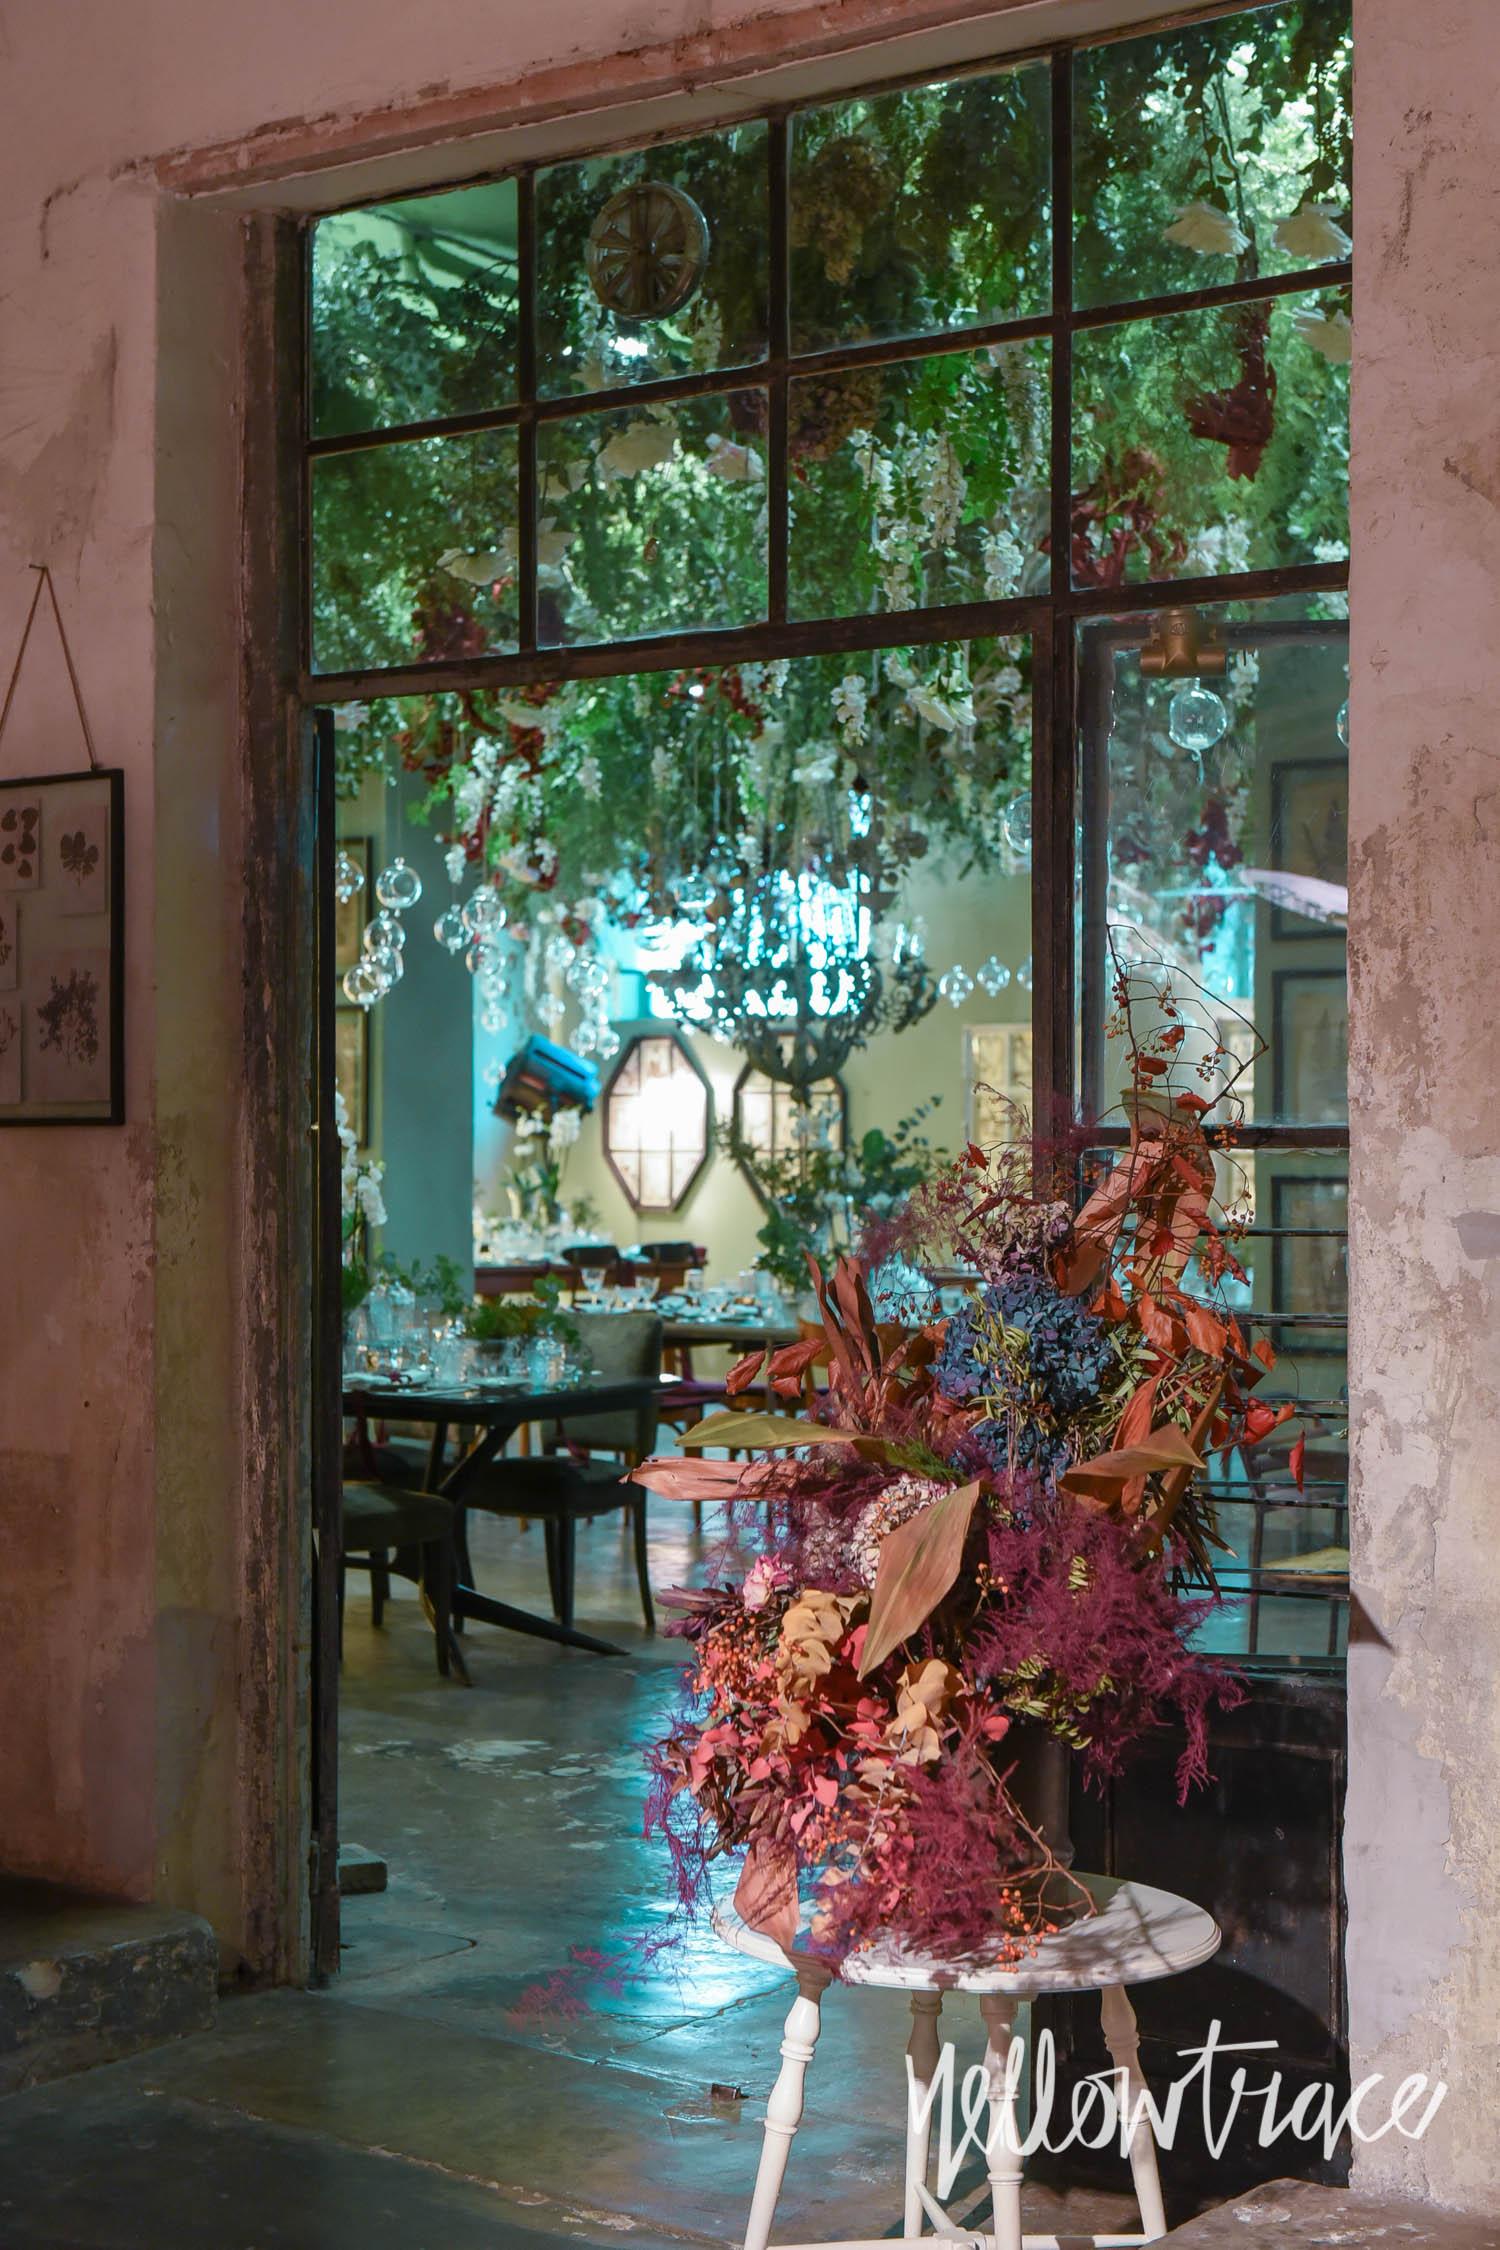 Milan Design Week 2017 Highlights, Pop-up restaurant at Nonostante Marras, Photo © Nick Hughes   #Milantrace2017